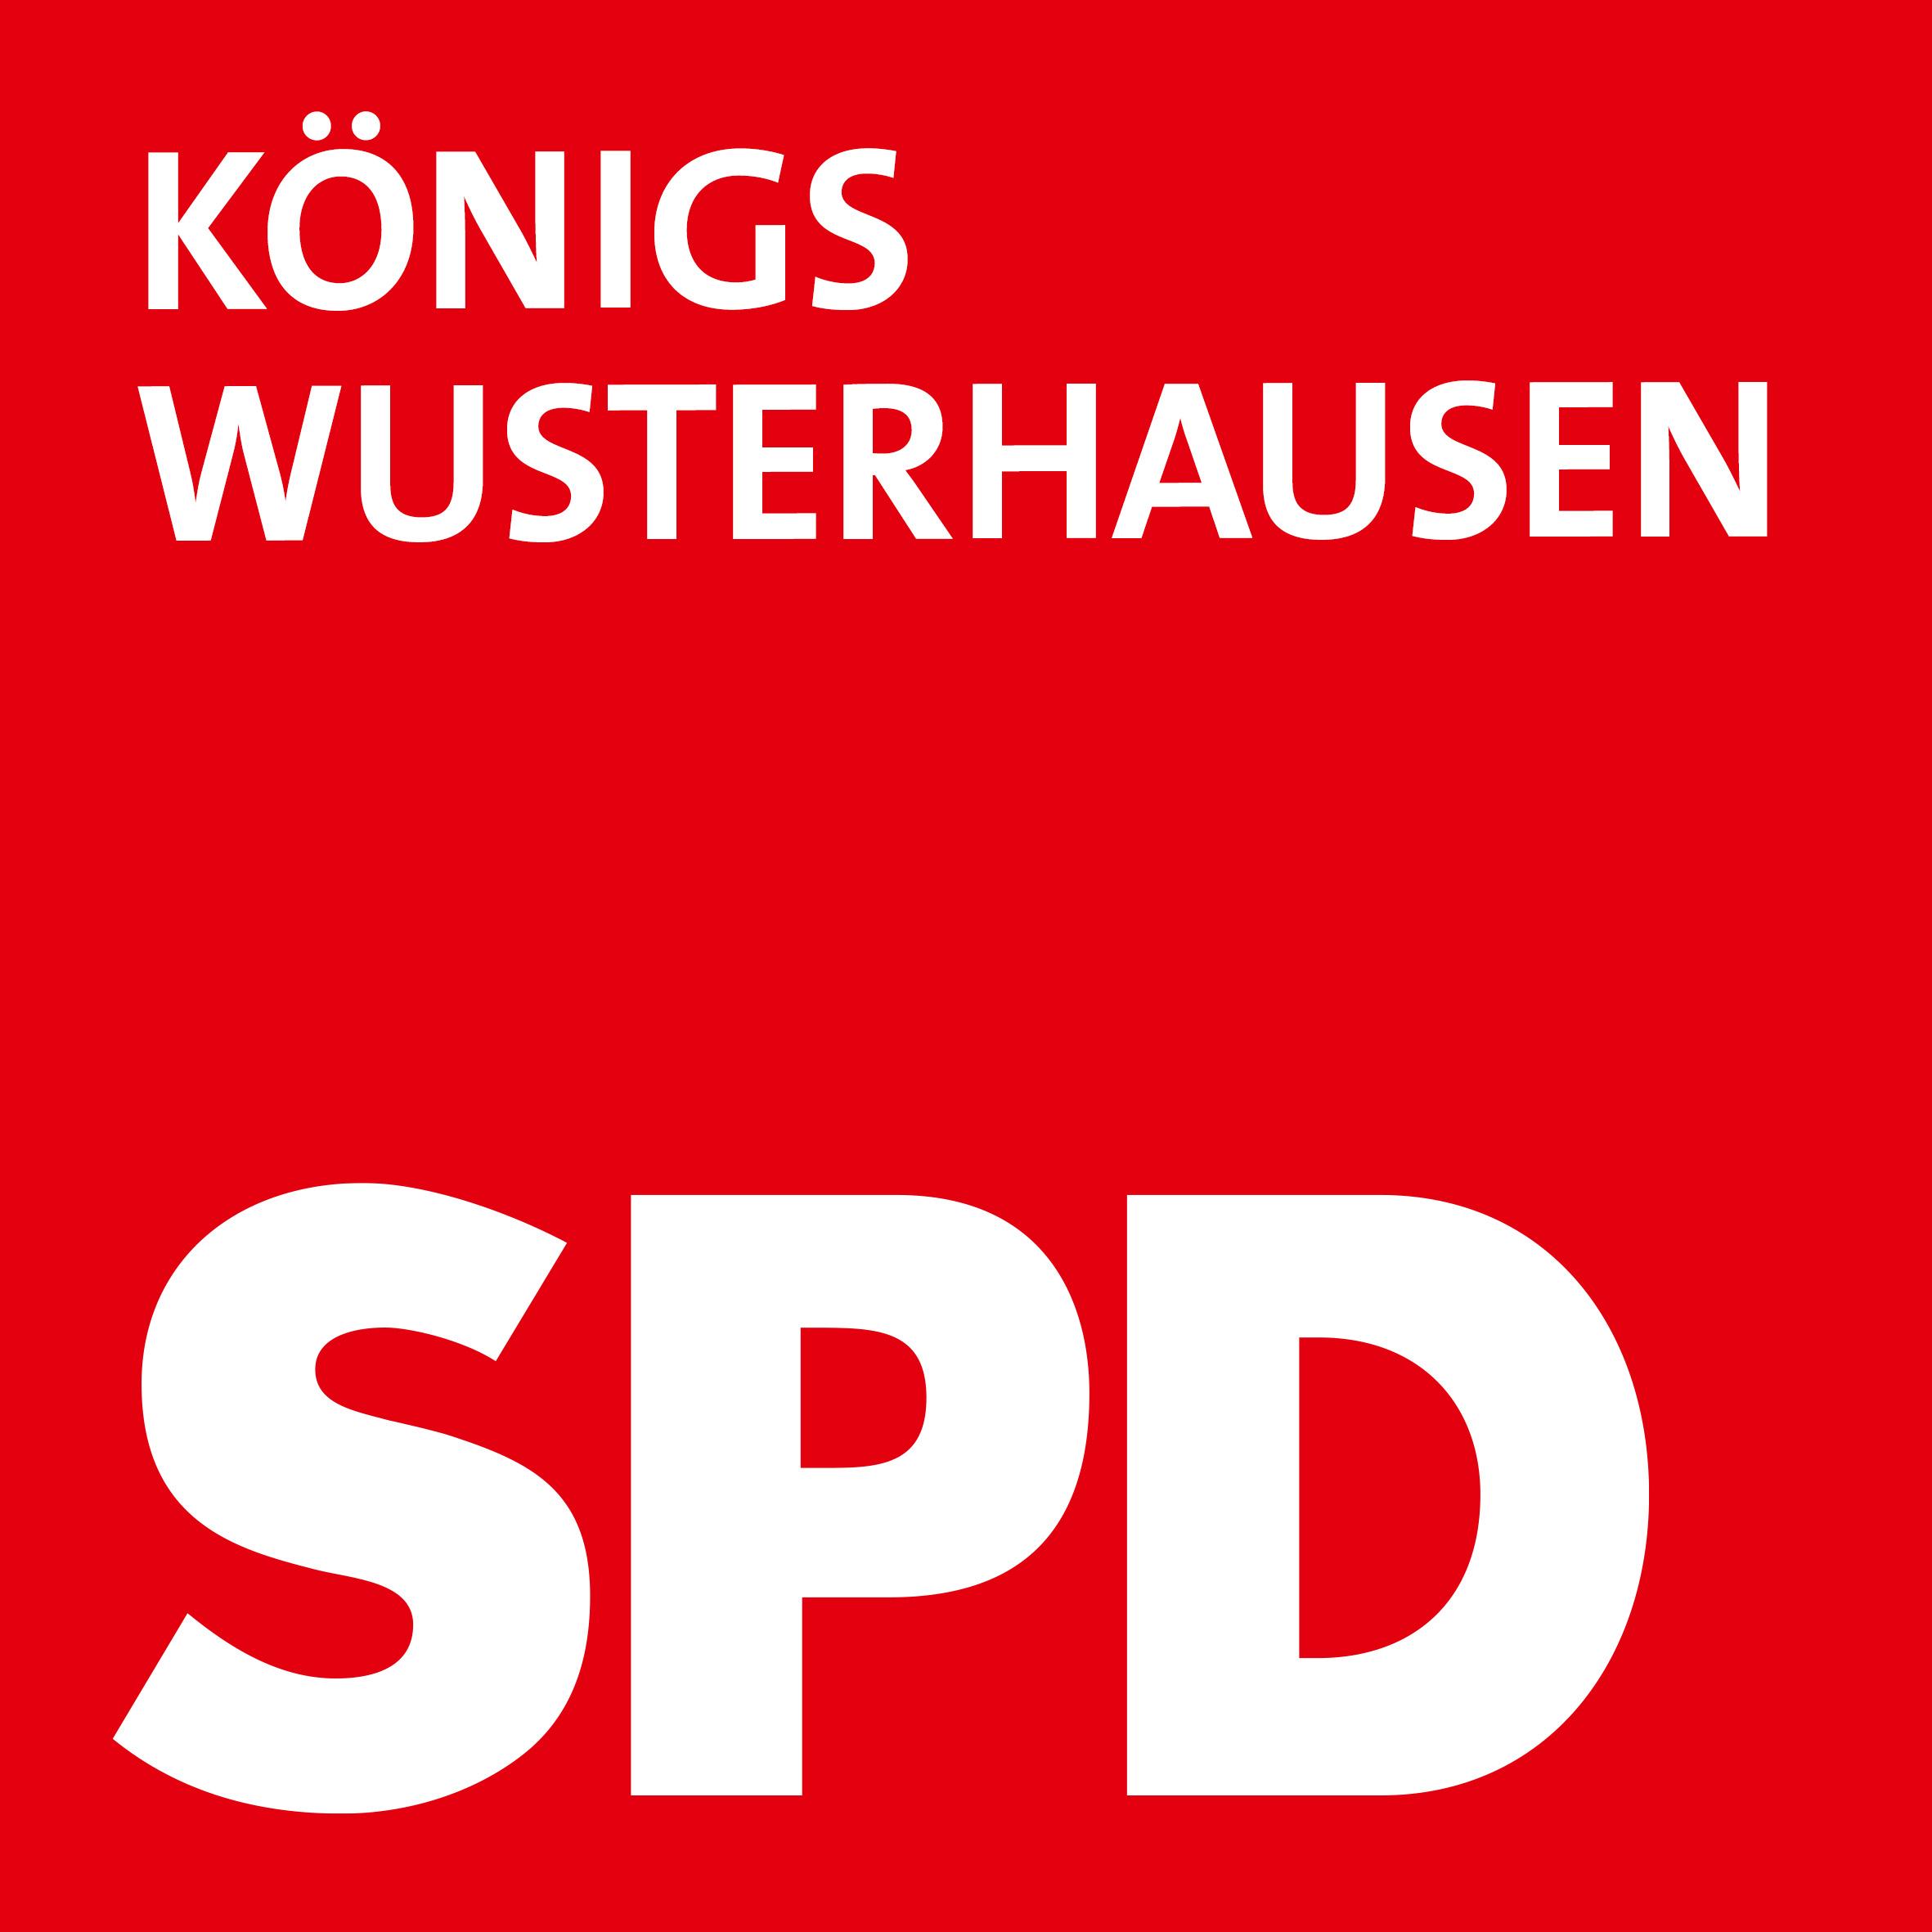 SPD Königs Wusterhausen